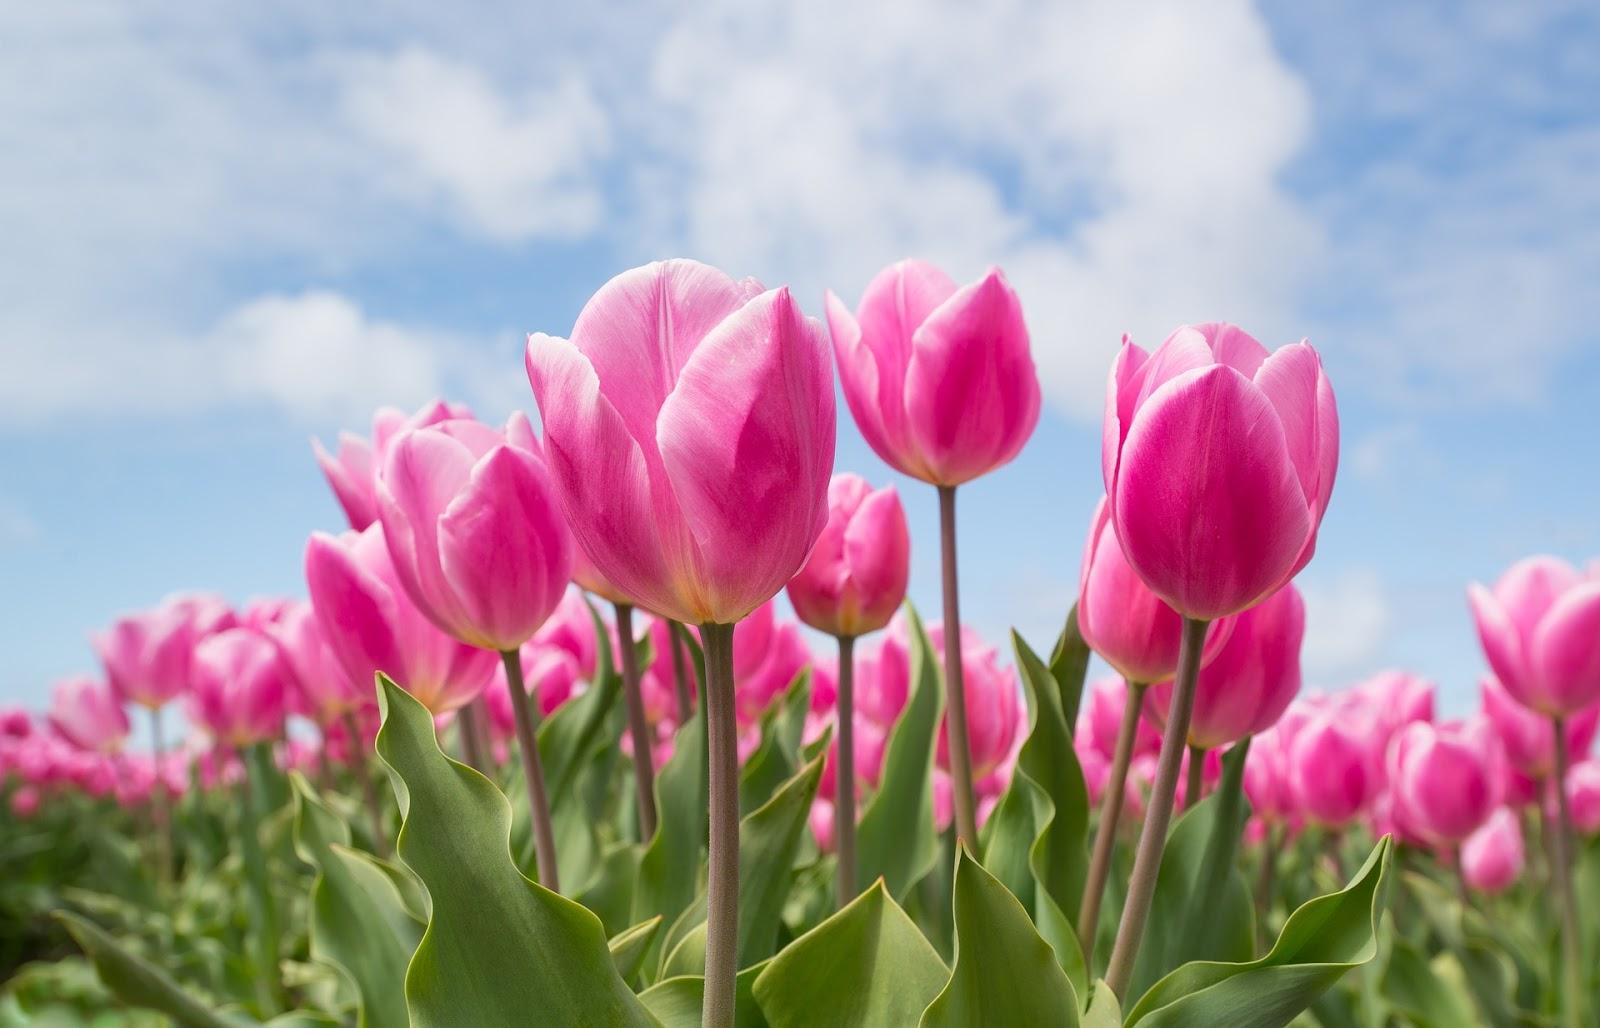 Koleksi Gambar Bunga Tulip Mekar Indah Dipandang